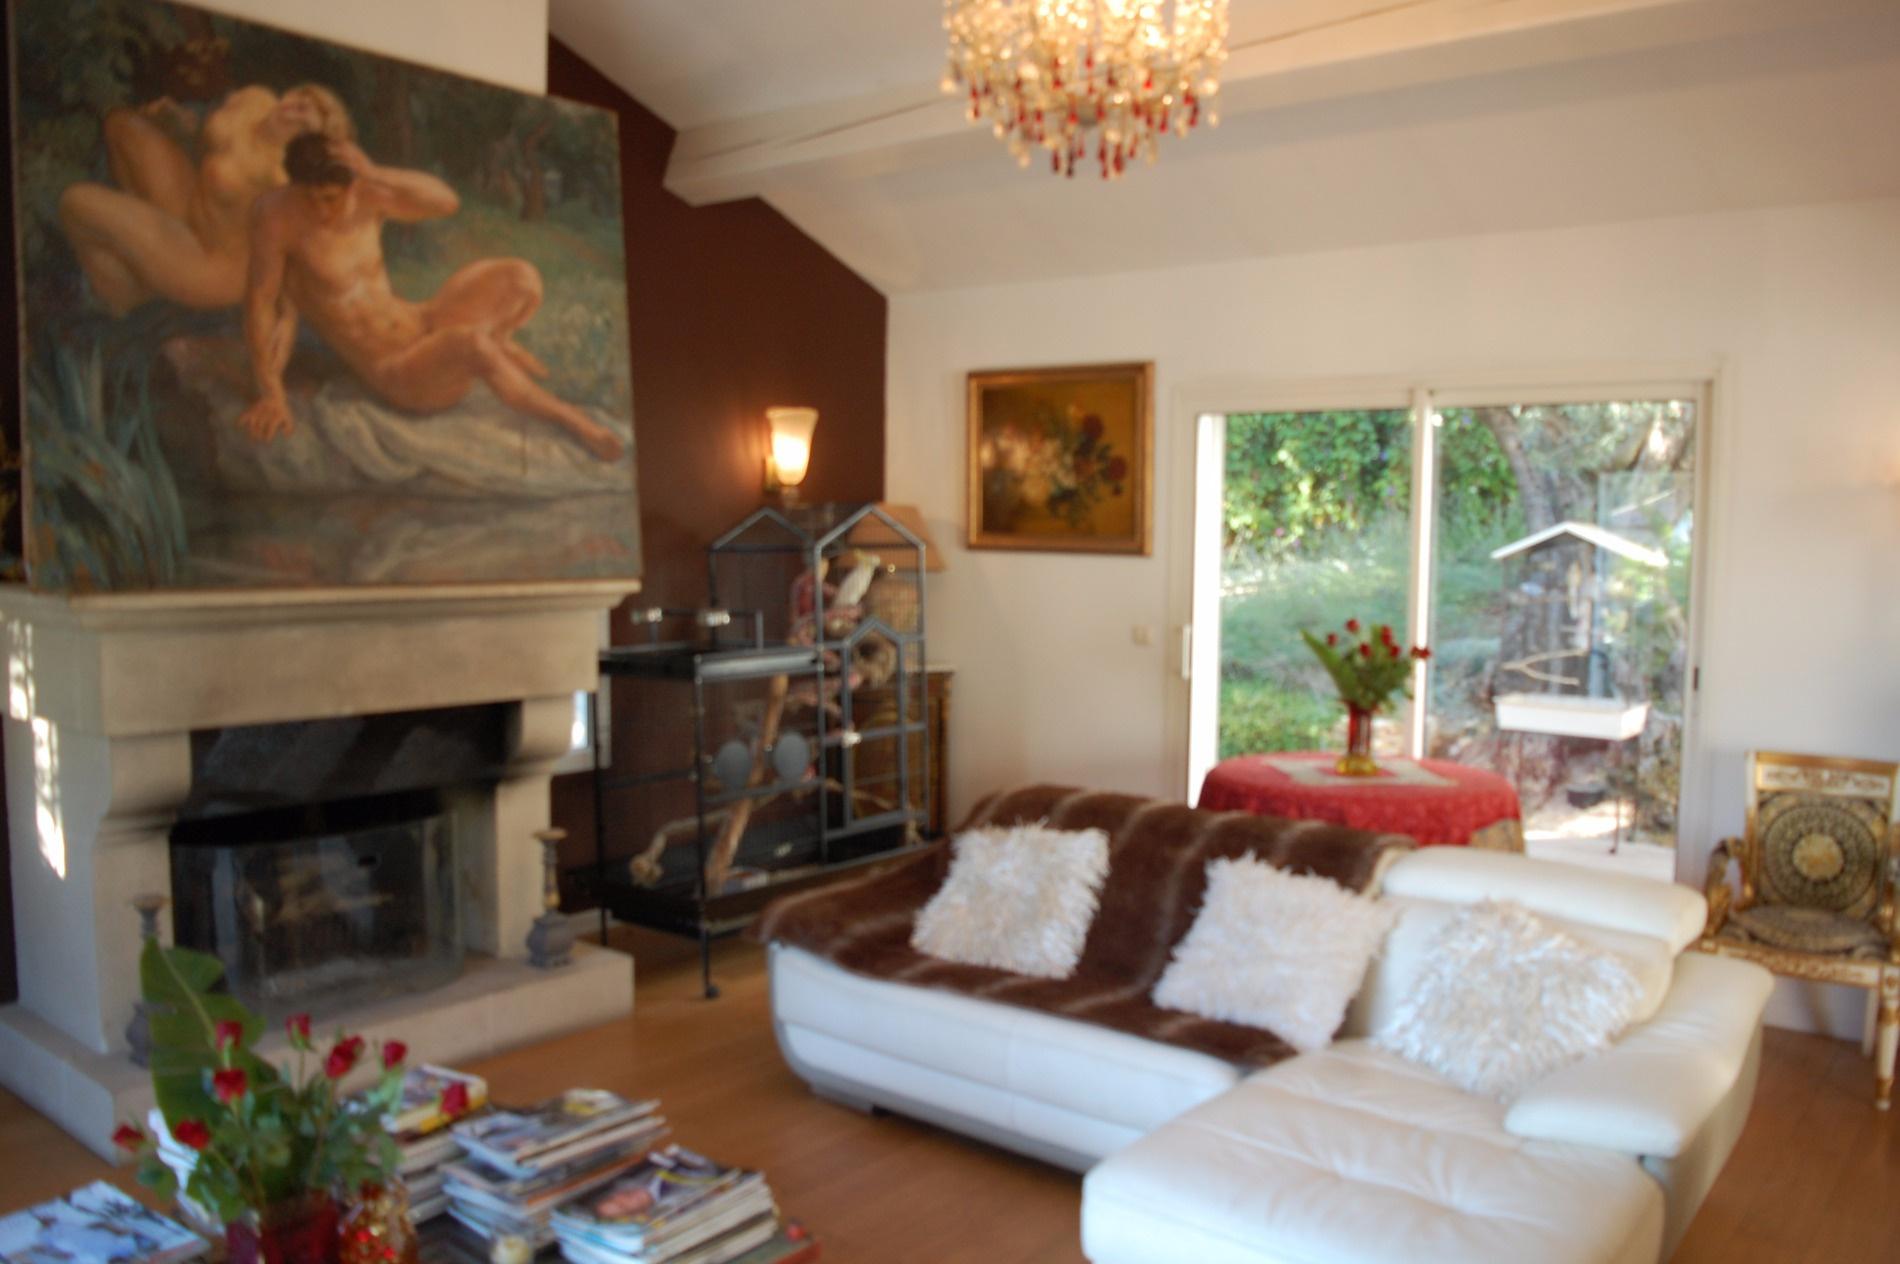 vente sanary sur mer maison environ 230 m 4 chambres possibilit 6. Black Bedroom Furniture Sets. Home Design Ideas